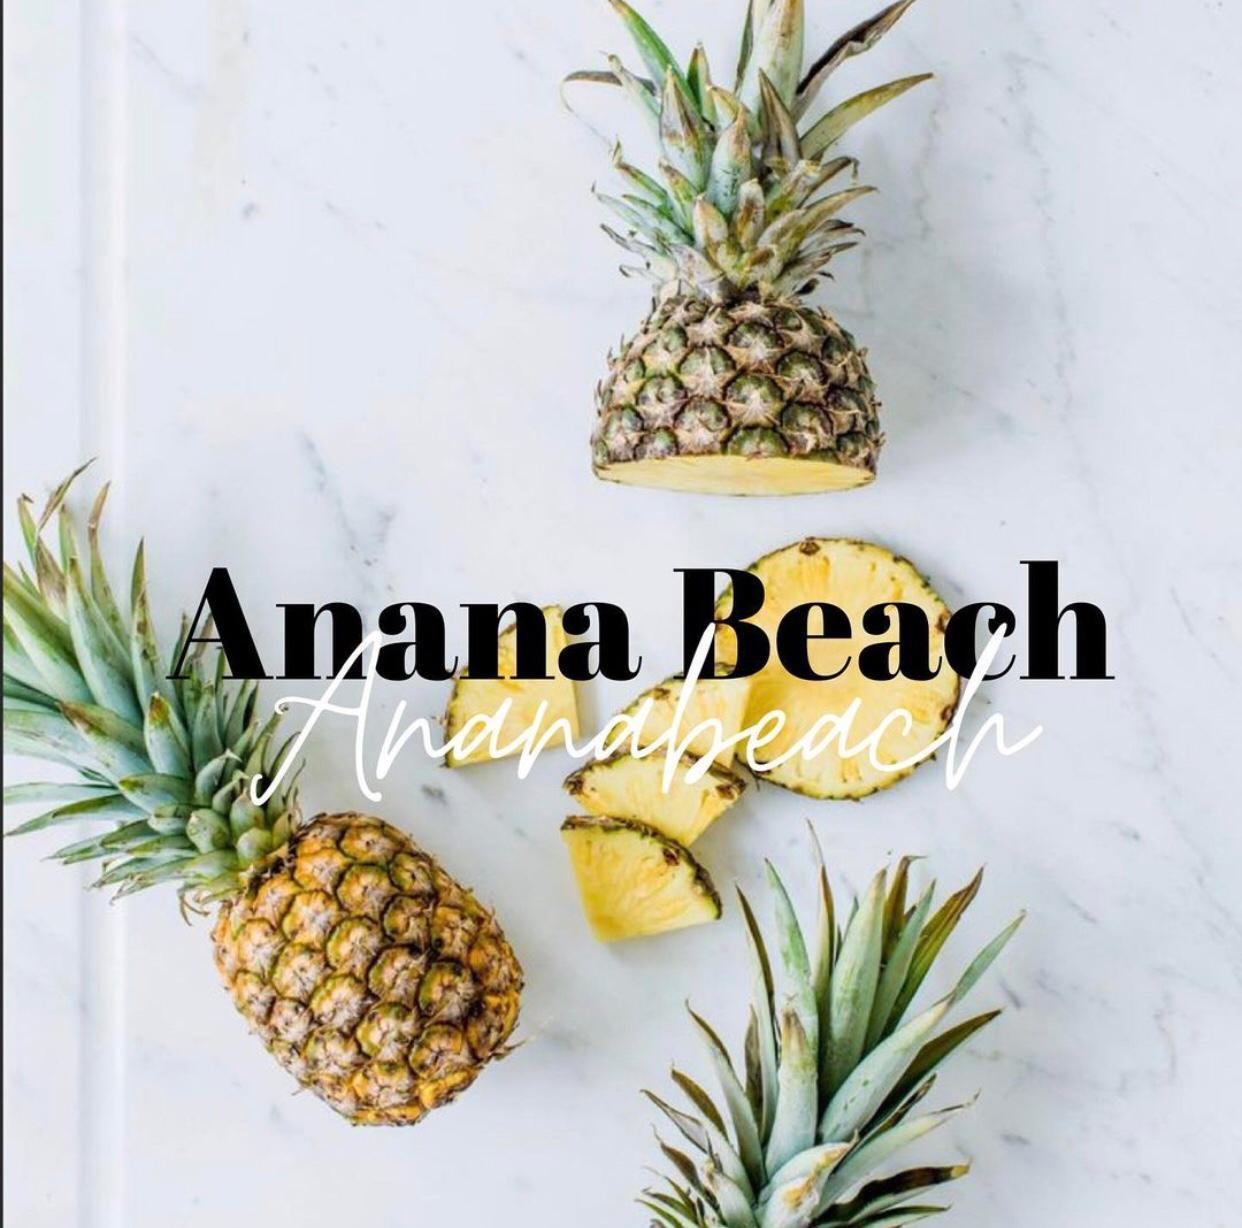 Anana Beach